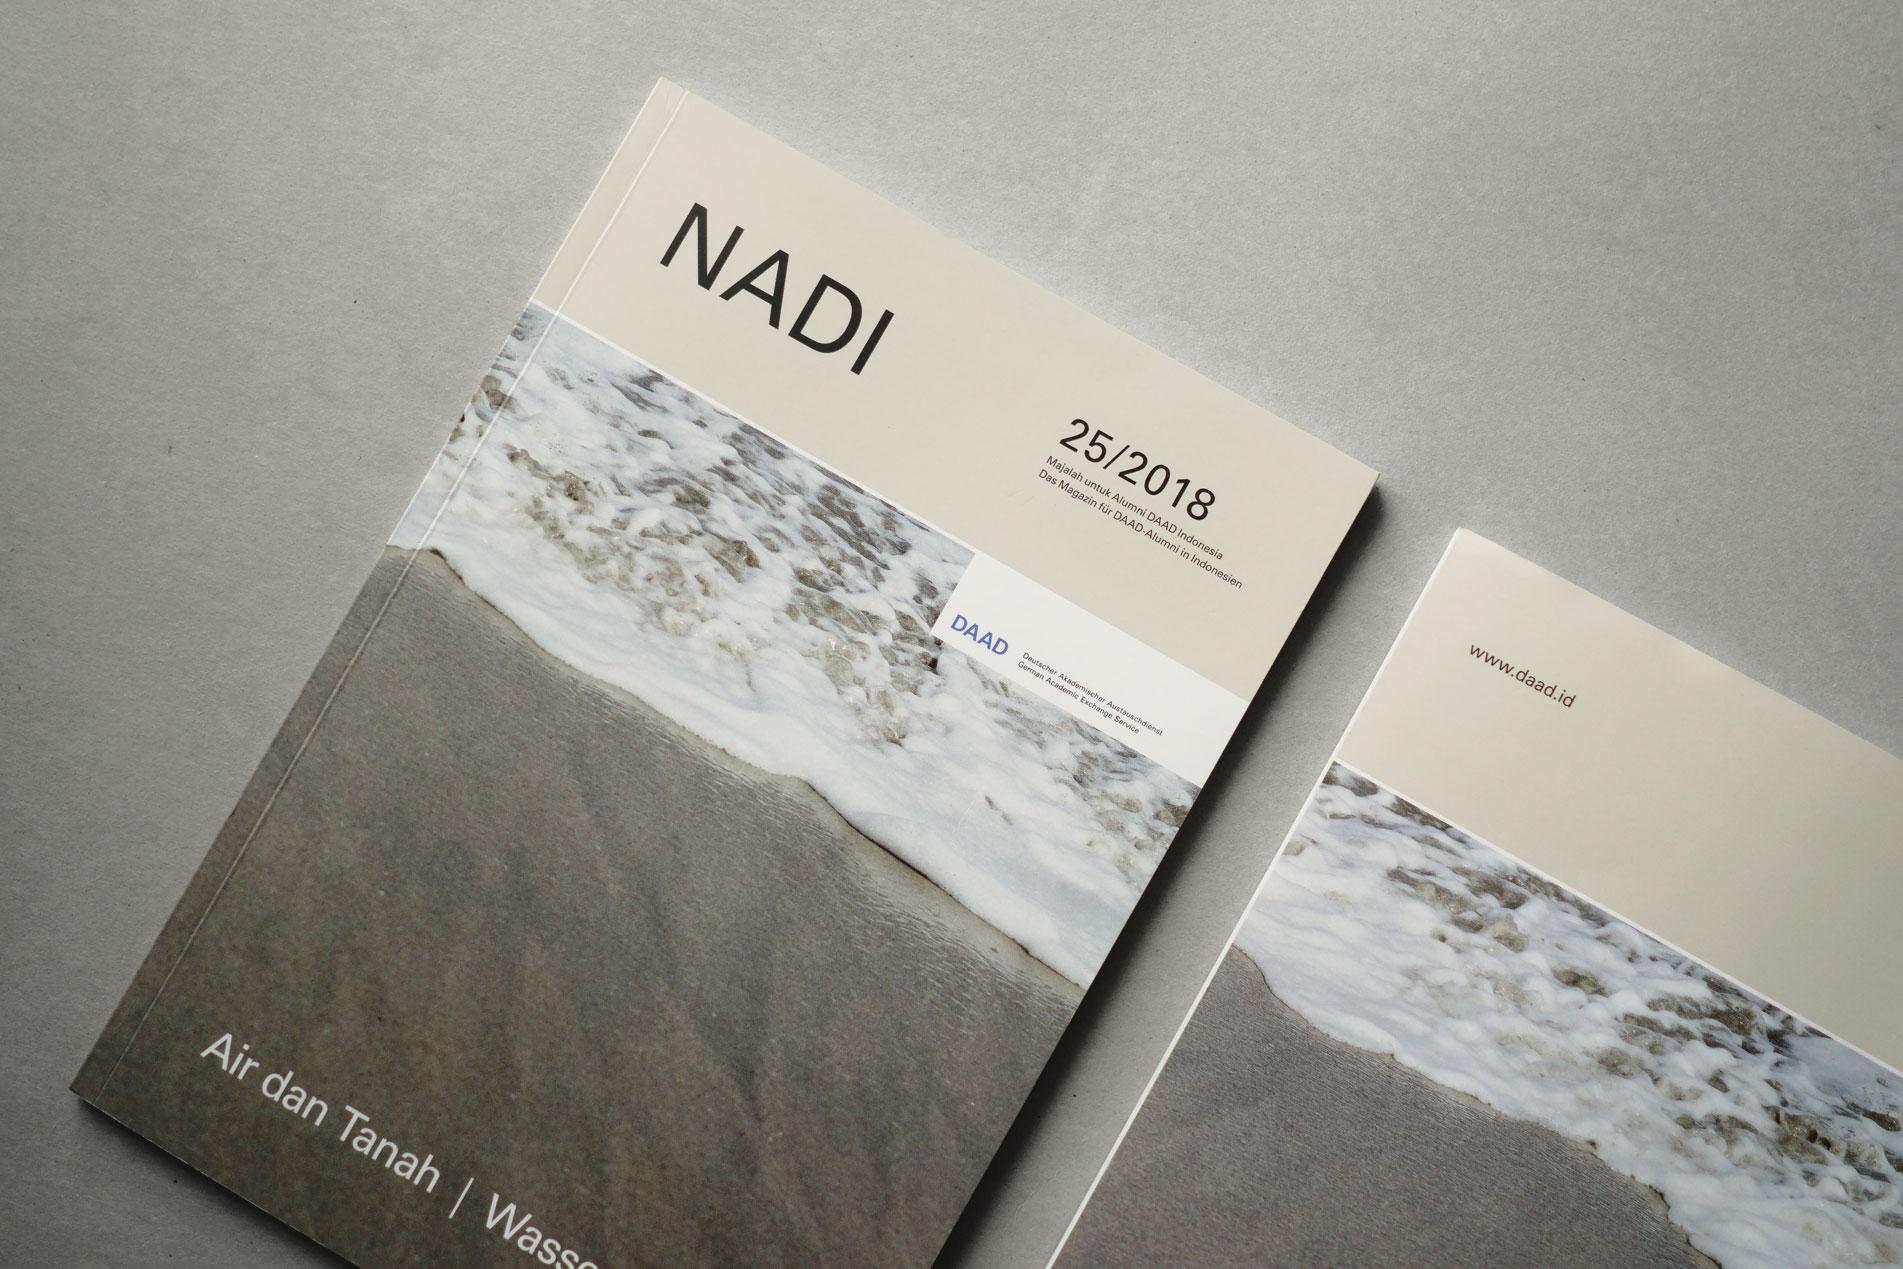 NADI Vol.25